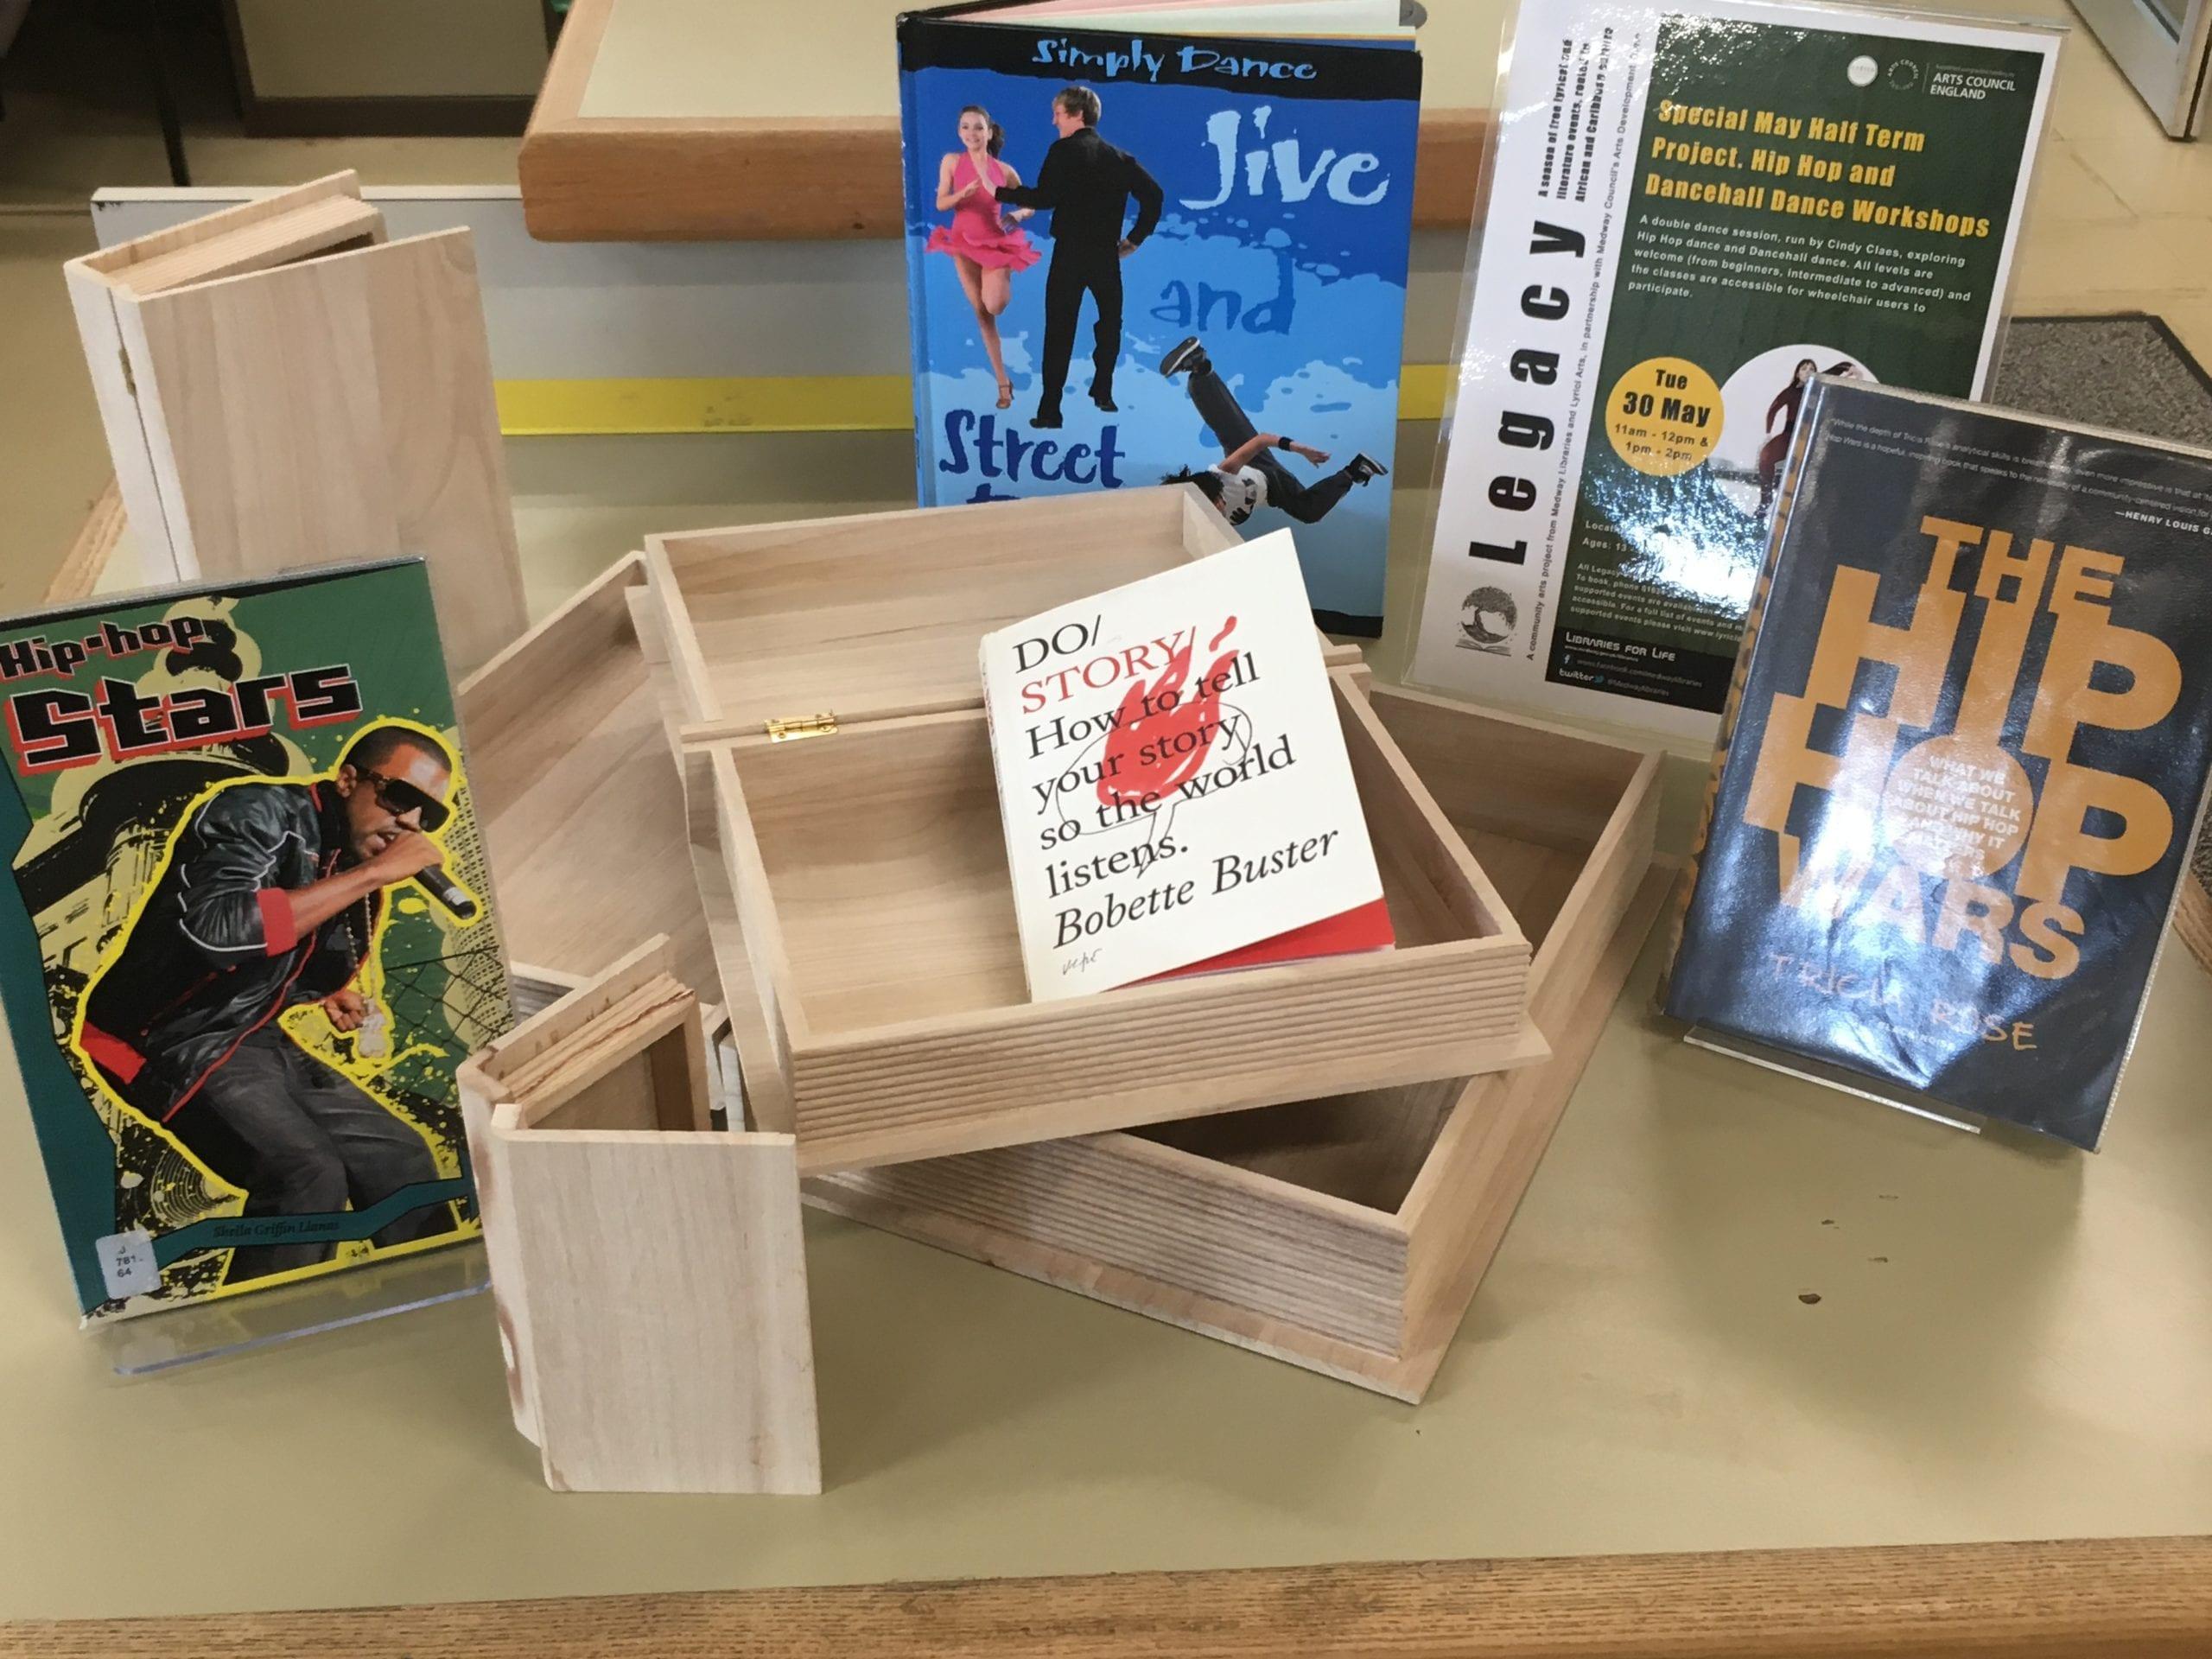 A book display at a library